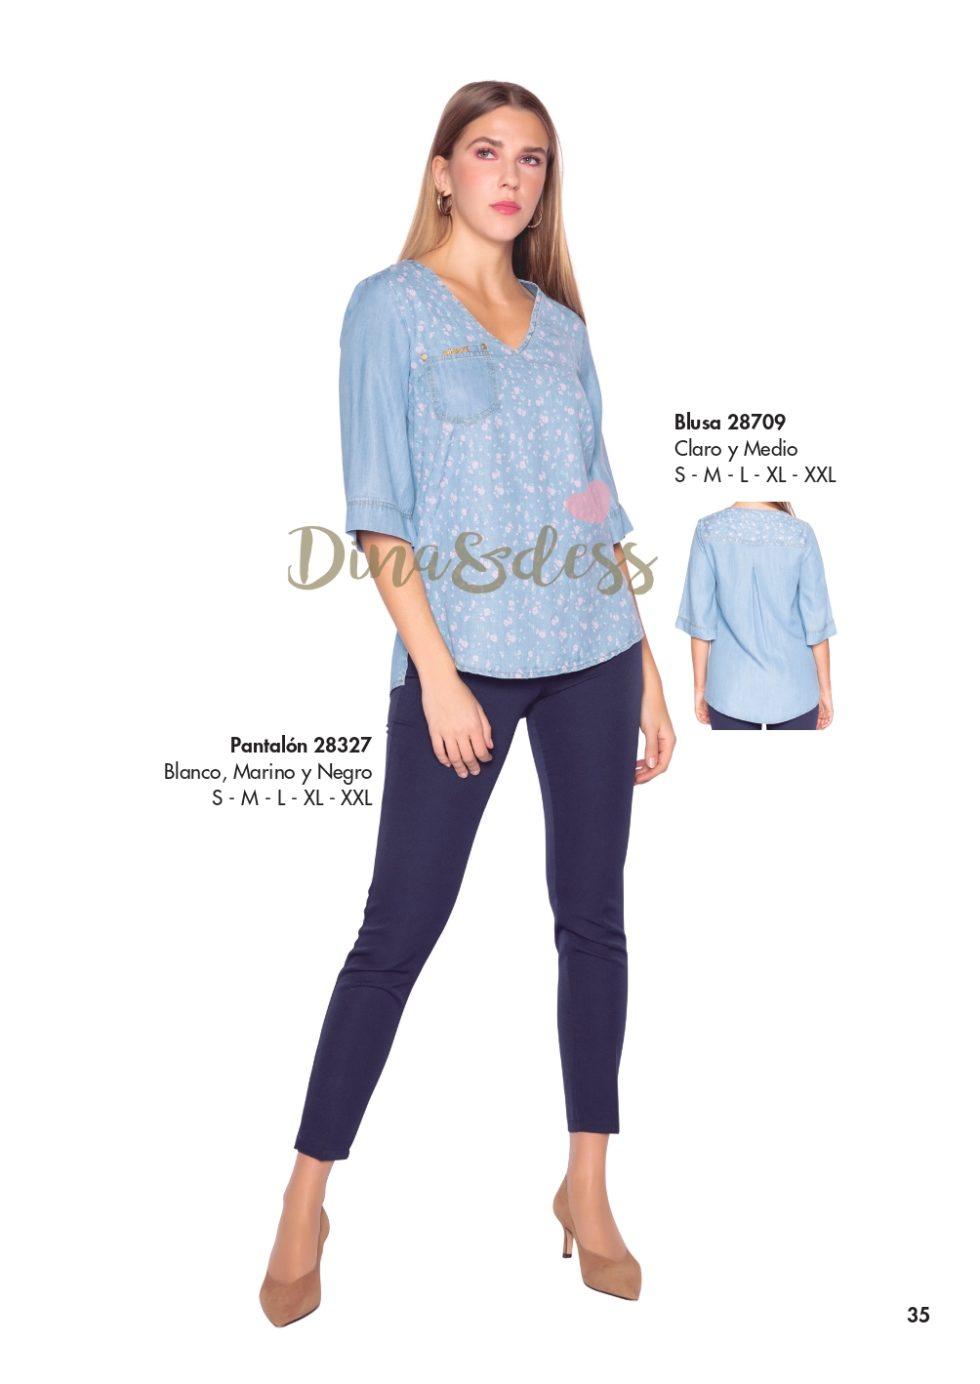 Verano 2021 Dina&Dess Clientes_page-0037